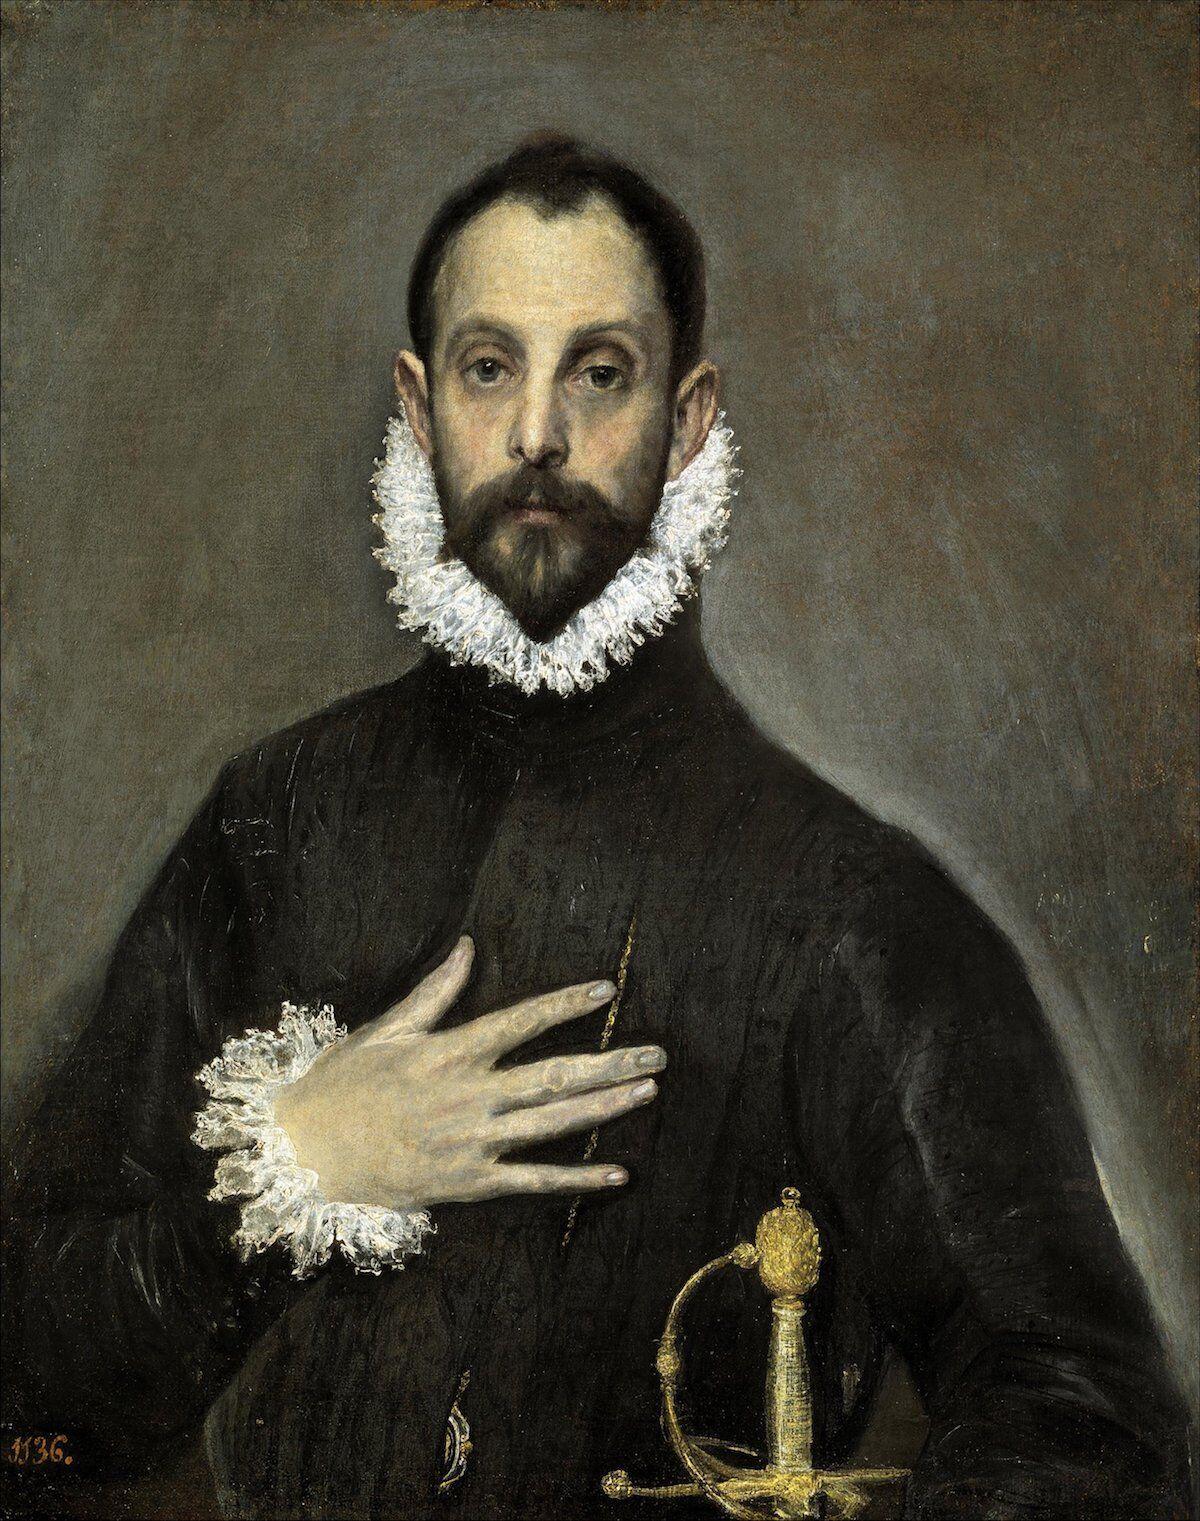 El Greco, The Nobleman with his Hand on his Chest, c. 1580. Museo Nacional del Prado, via Wikimedia Commons.